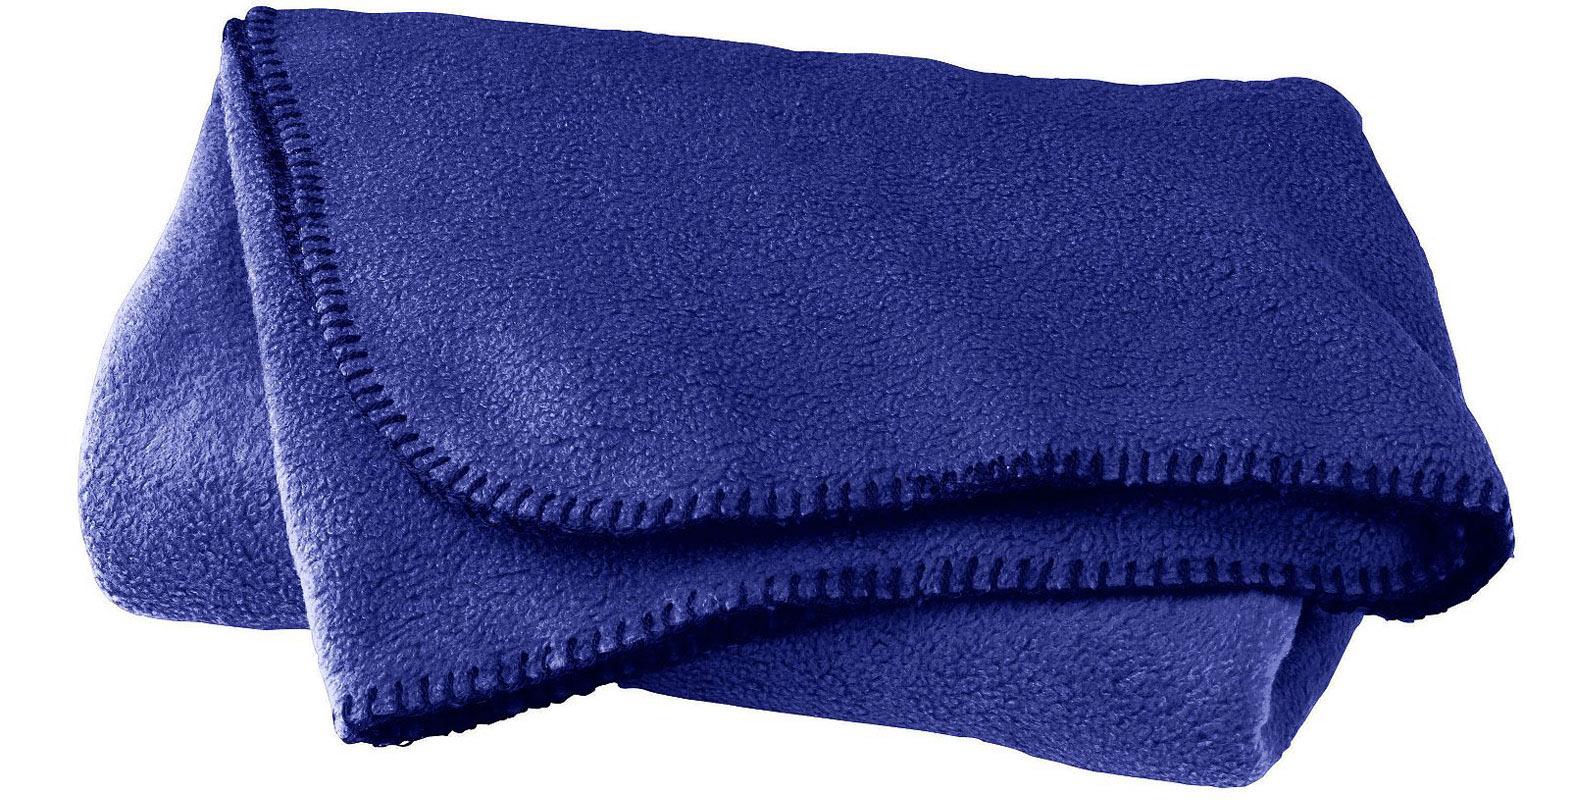 Clipart Blanket Blanket On Bed